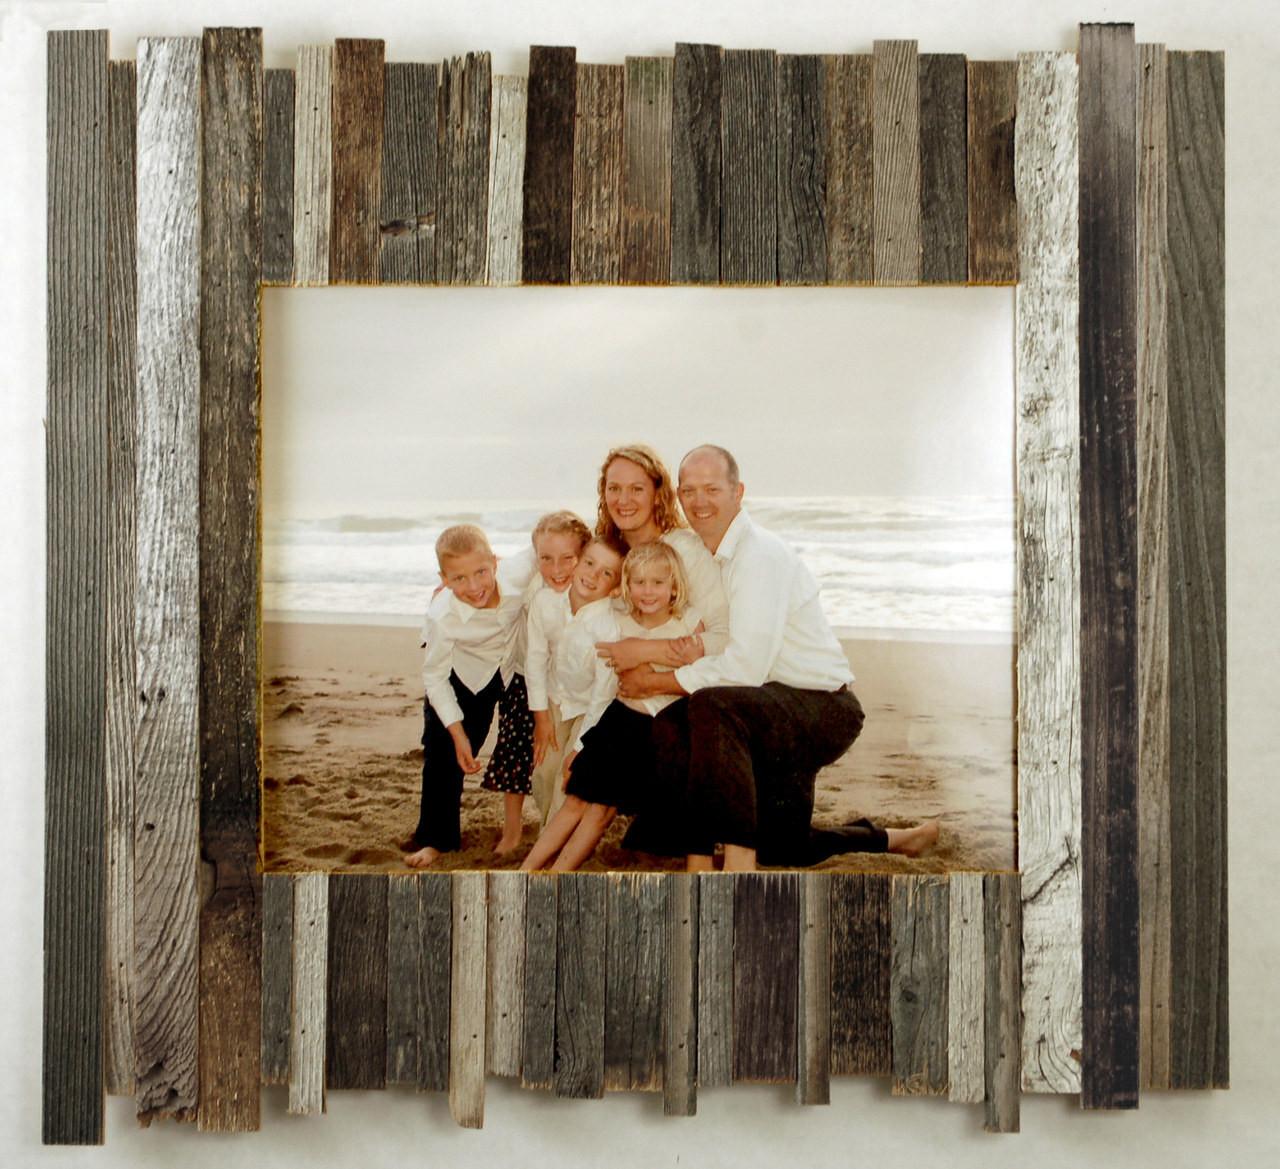 Beachcomber Reclaimed Wood Frame 8x10